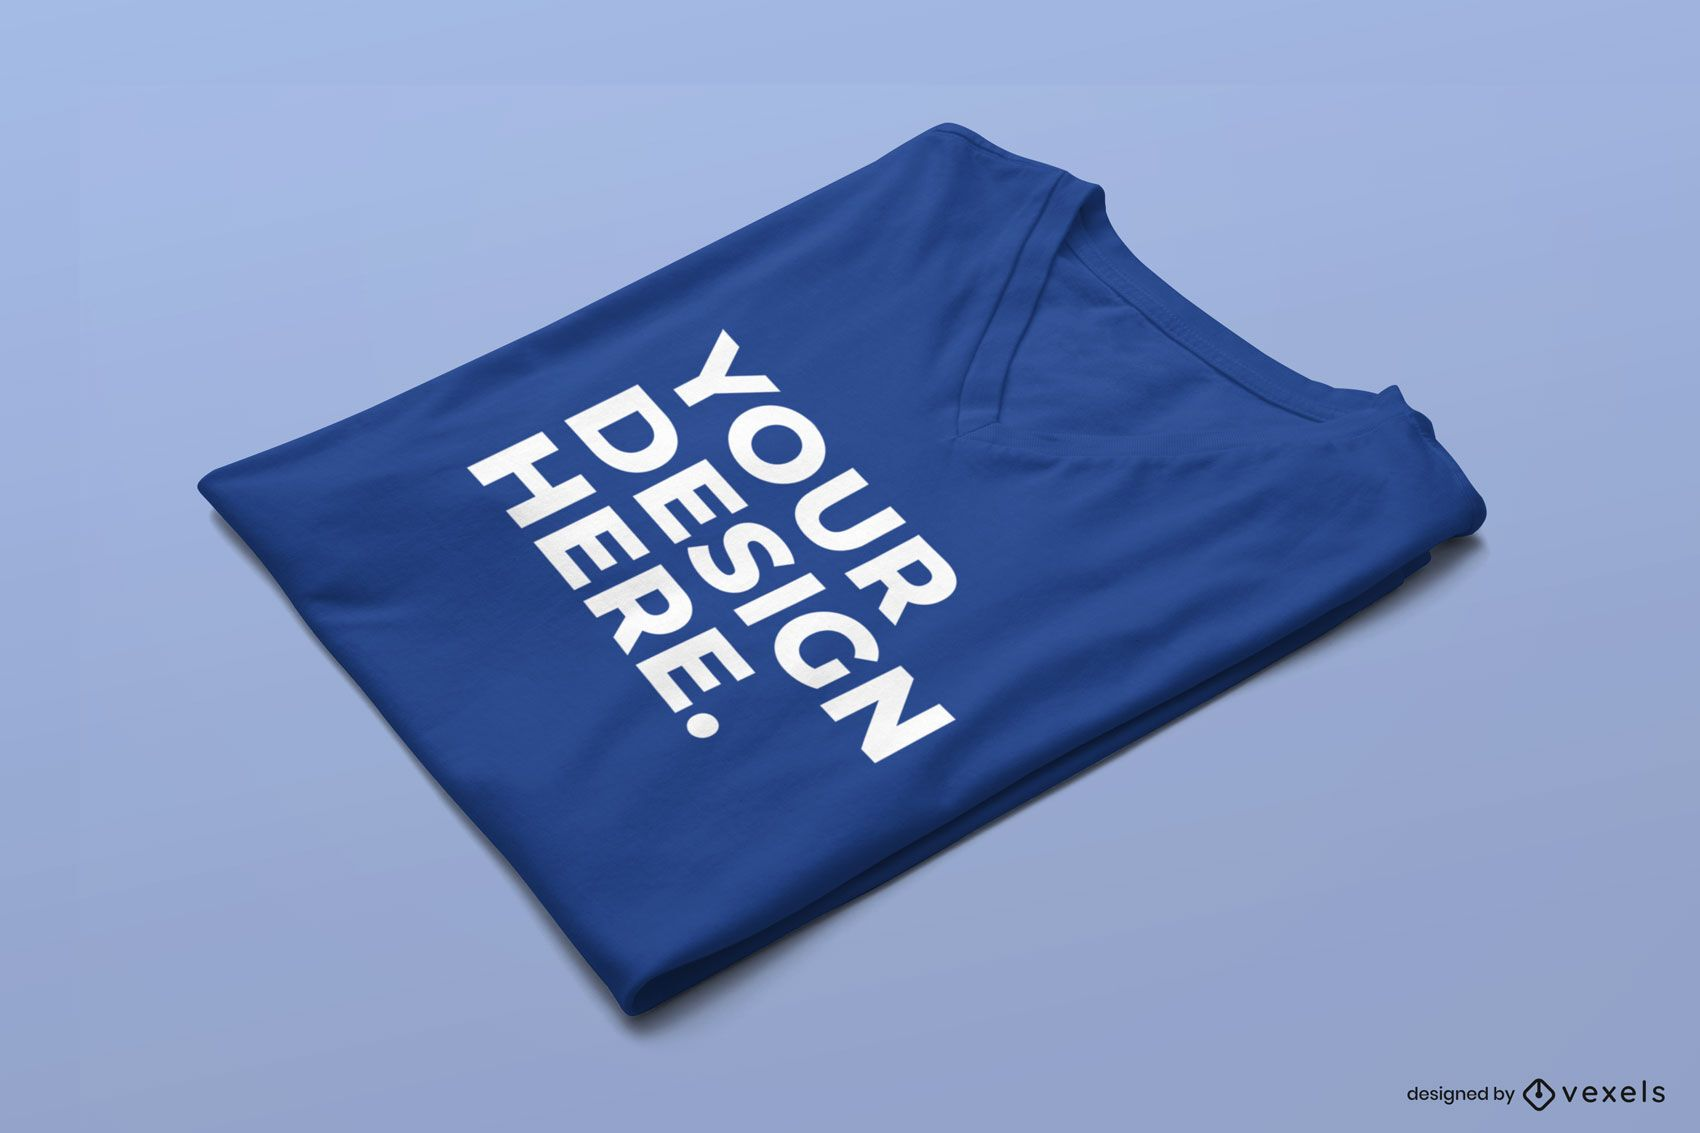 Folded V neck t-shirt mockup